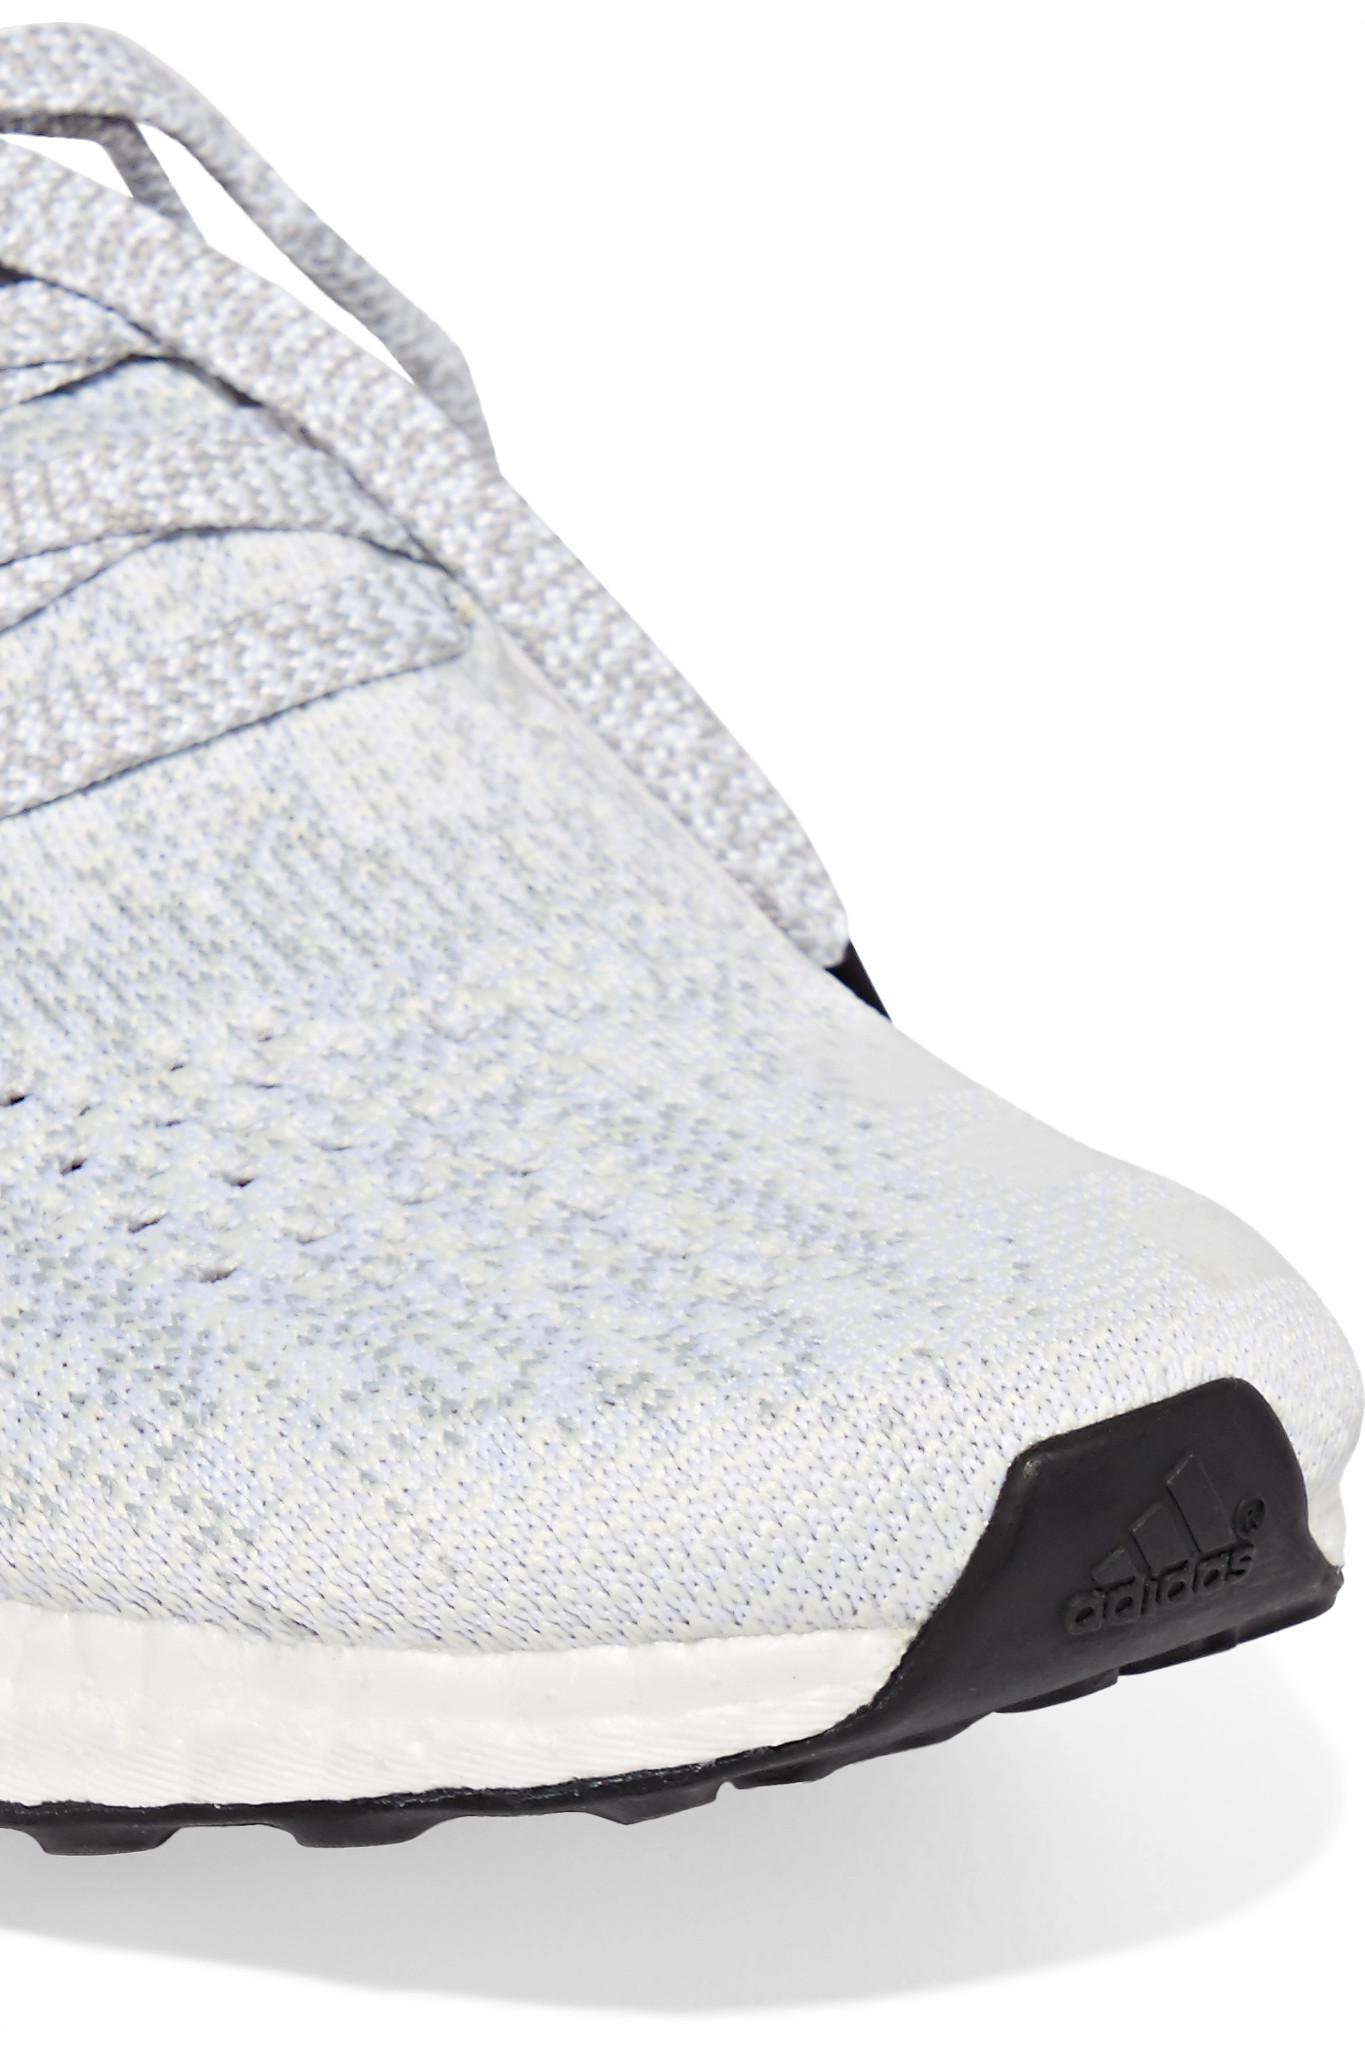 8cdbd1b4e934 adidas Originals Ultraboost Uncaged Primeknit Sneakers in White - Lyst